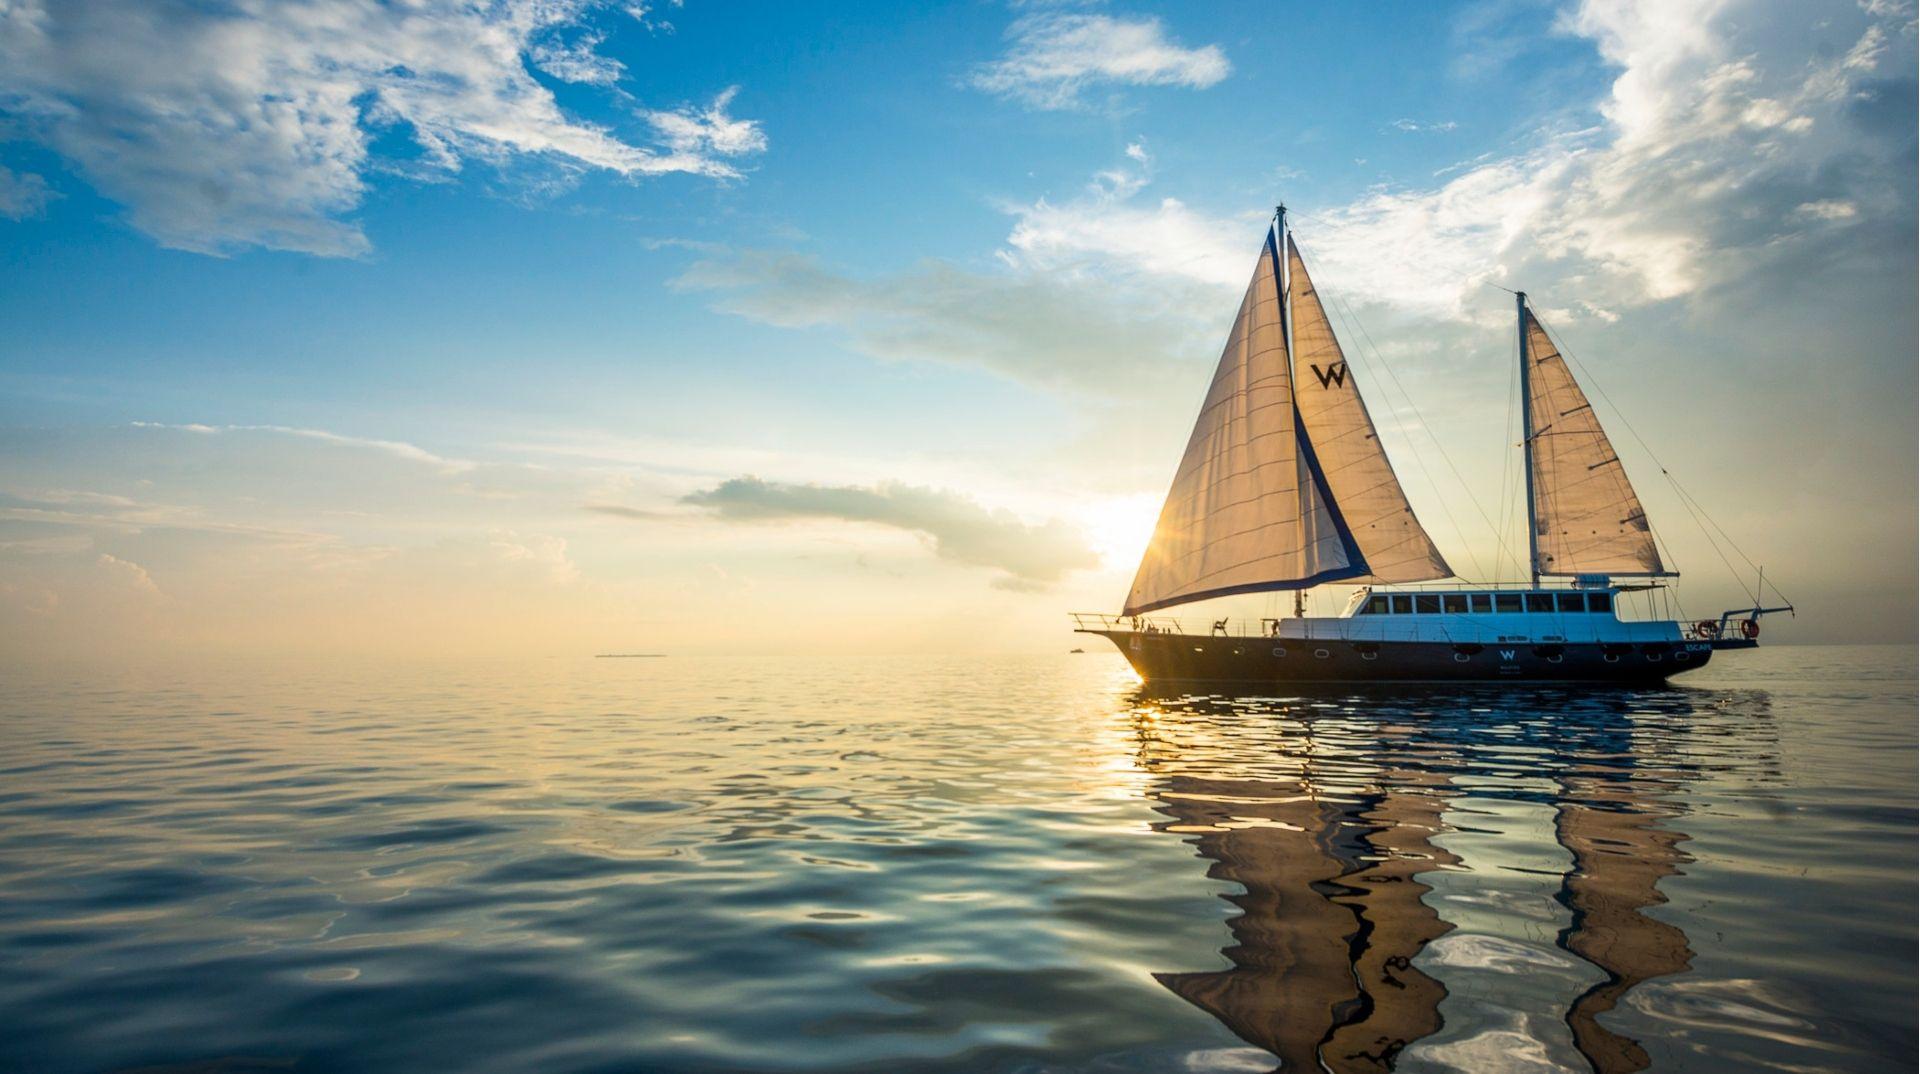 Sunset cruise on ESCAPE